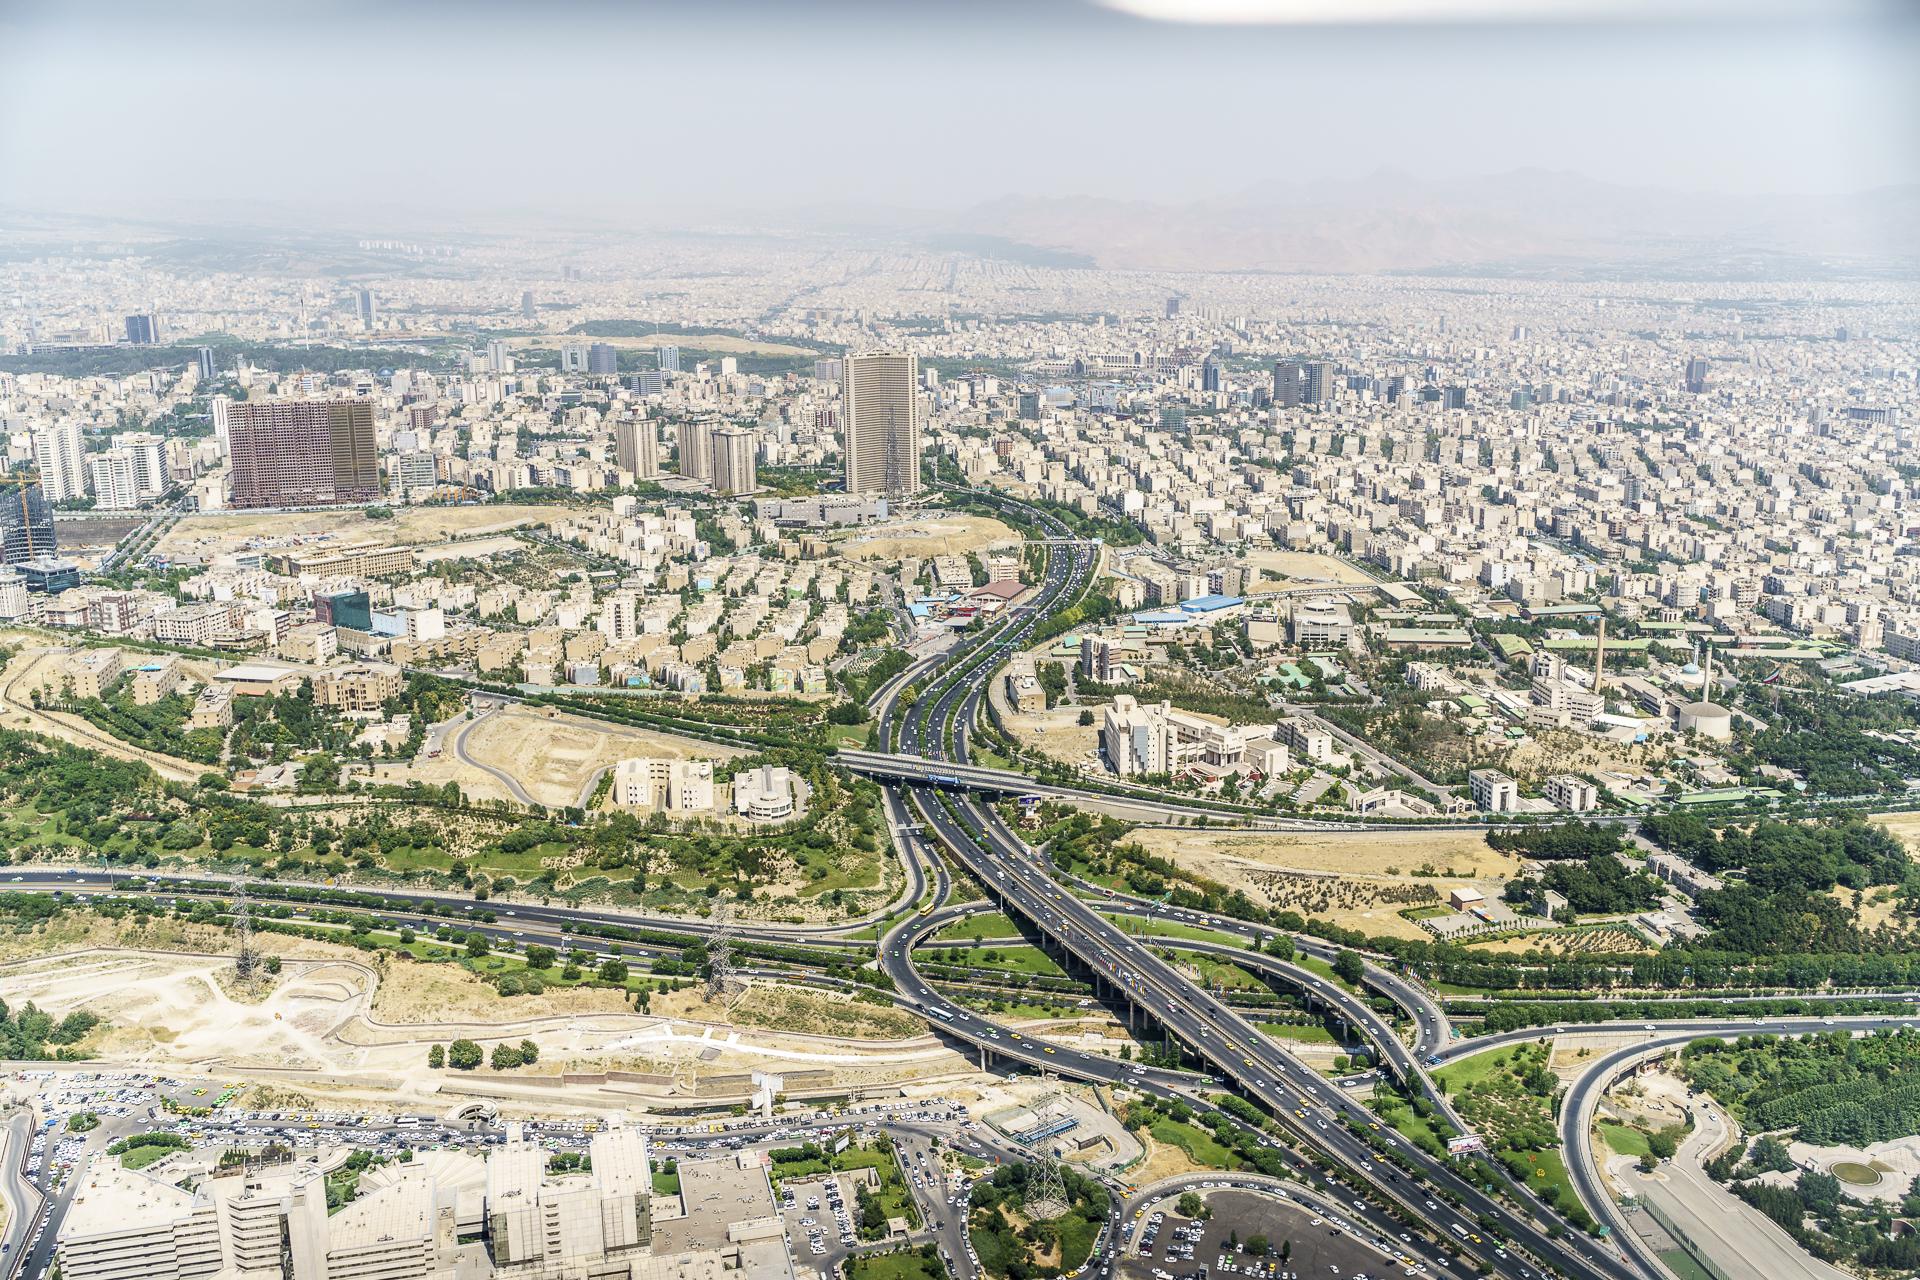 15 Millionenmetropole Teheran